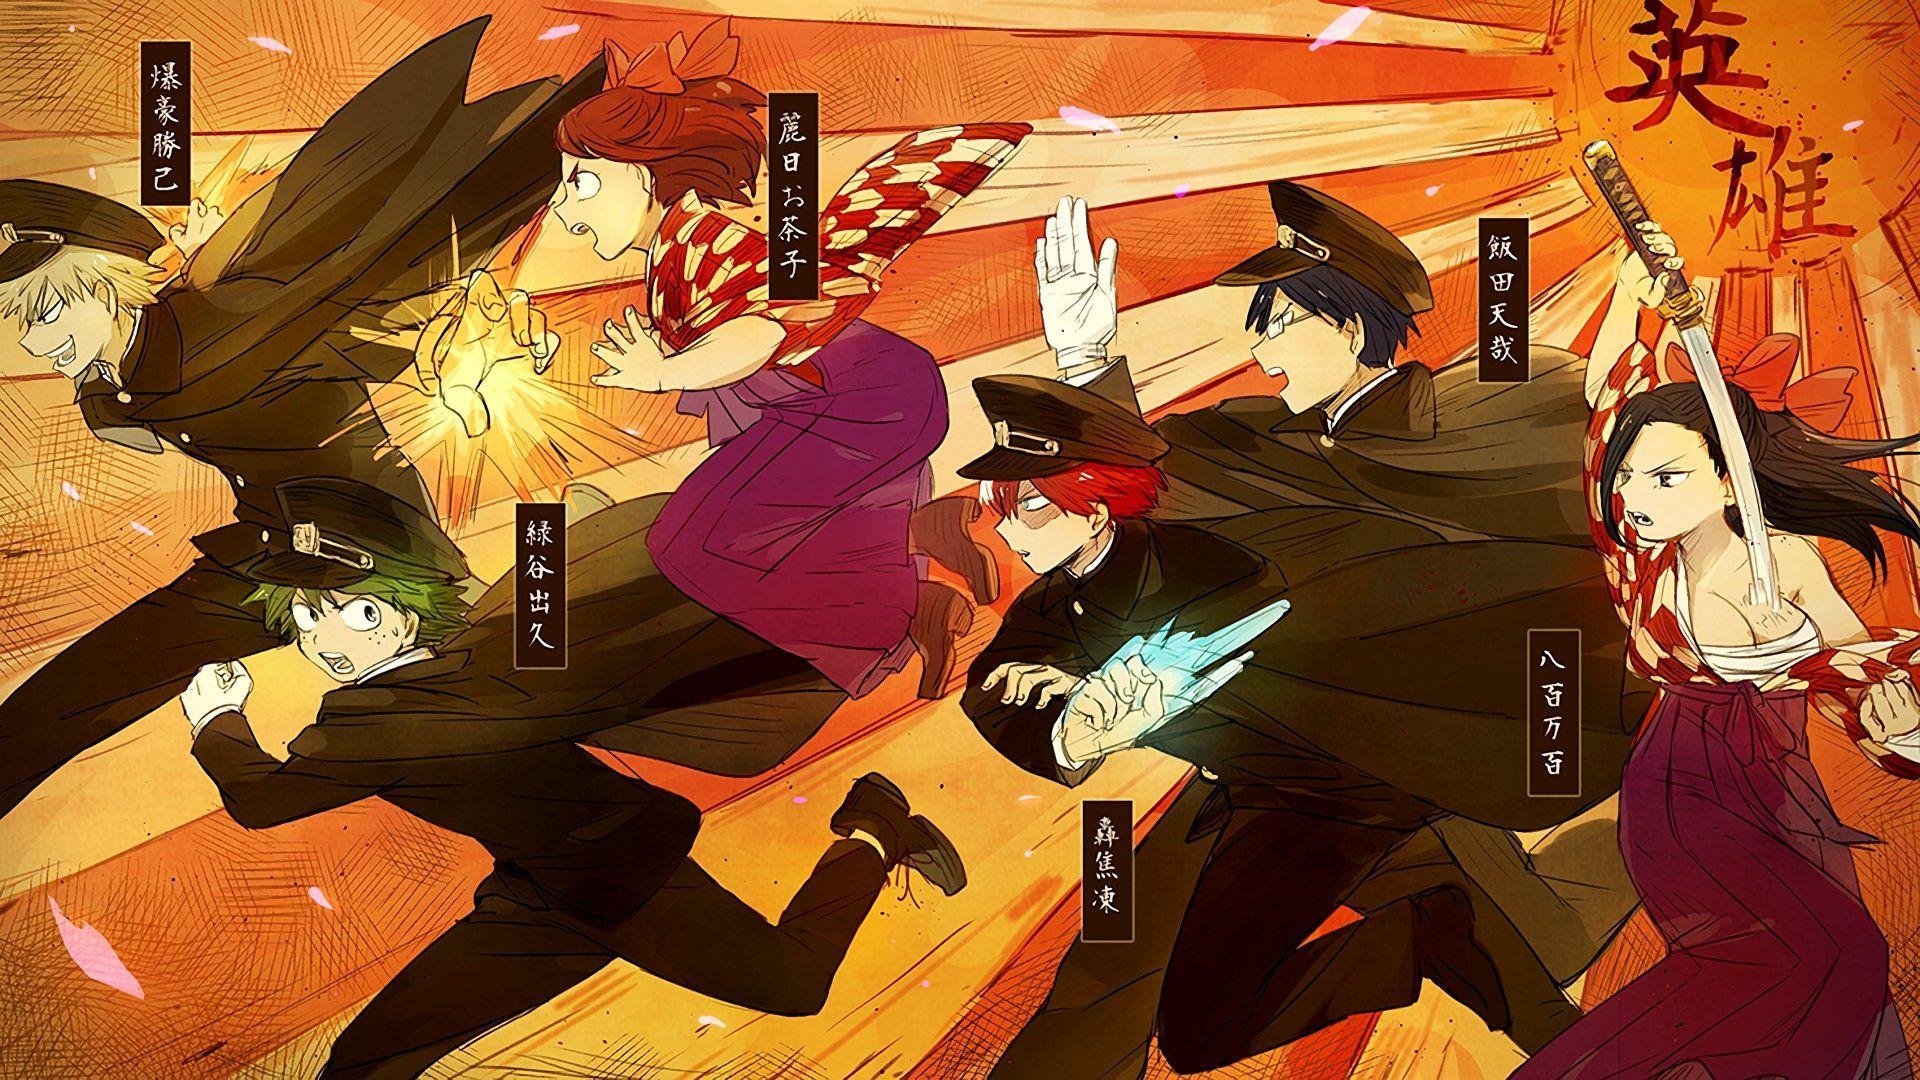 Anime My Hero Academia Izuku Midoriya Ochako Uraraka Katsuki Bakugou